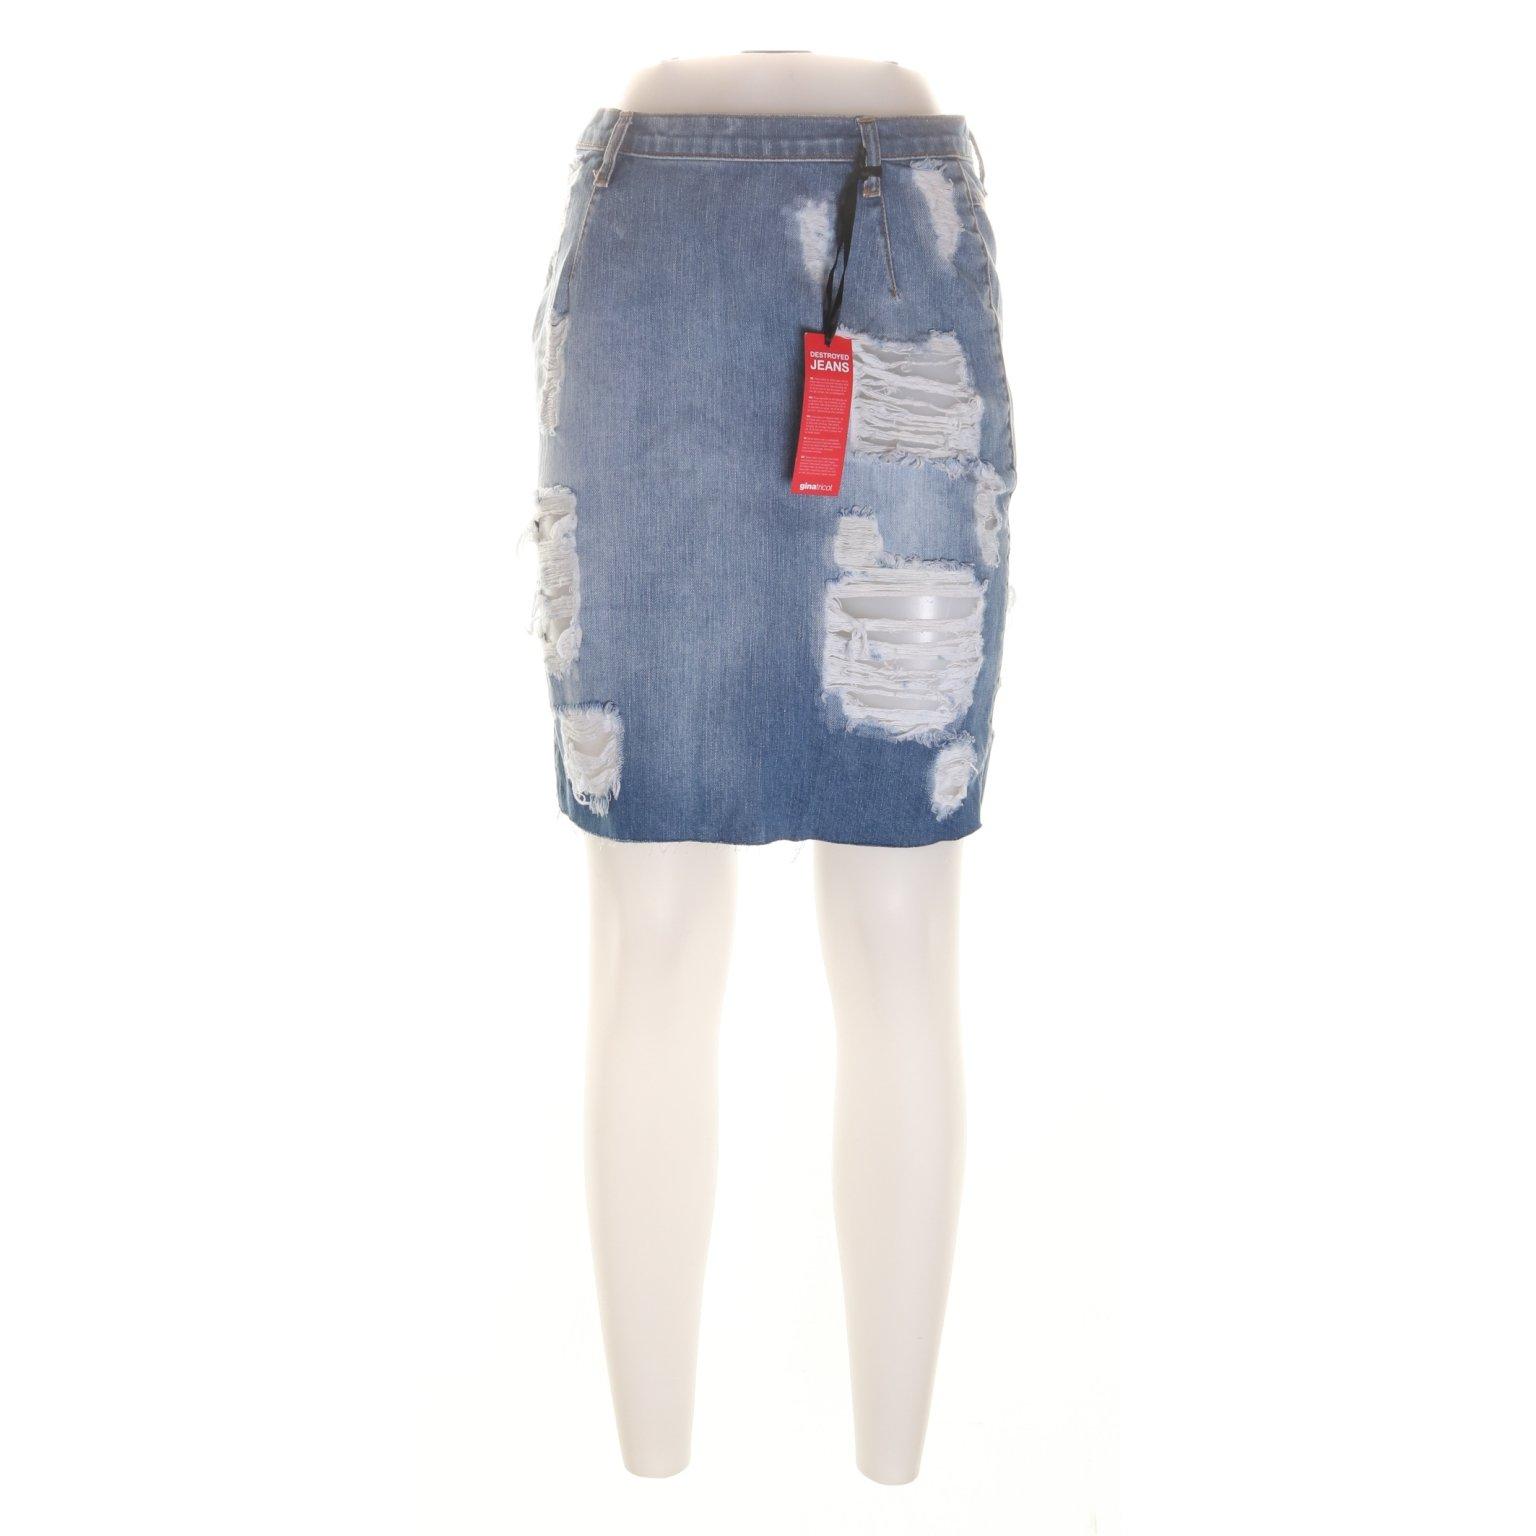 72f215a9cf5c Perfect Jeans Gina Tricot, Kjol, Strl: 36, Blå (350714676) ᐈ Sellpy ...